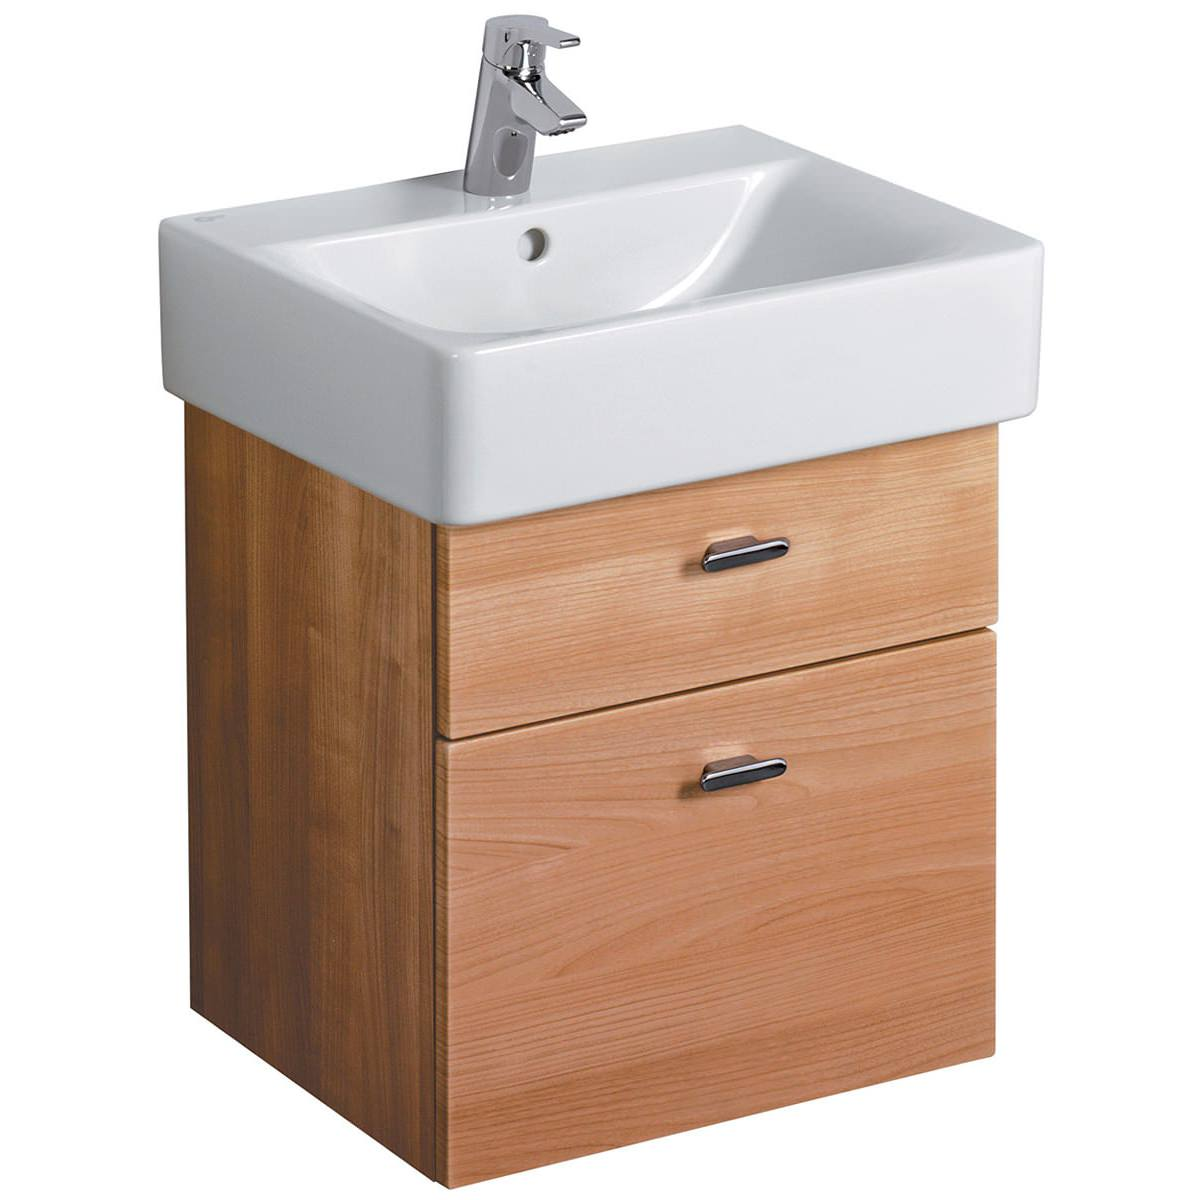 ideal standard concept cube 450mm wall hung 2 drawer basin. Black Bedroom Furniture Sets. Home Design Ideas